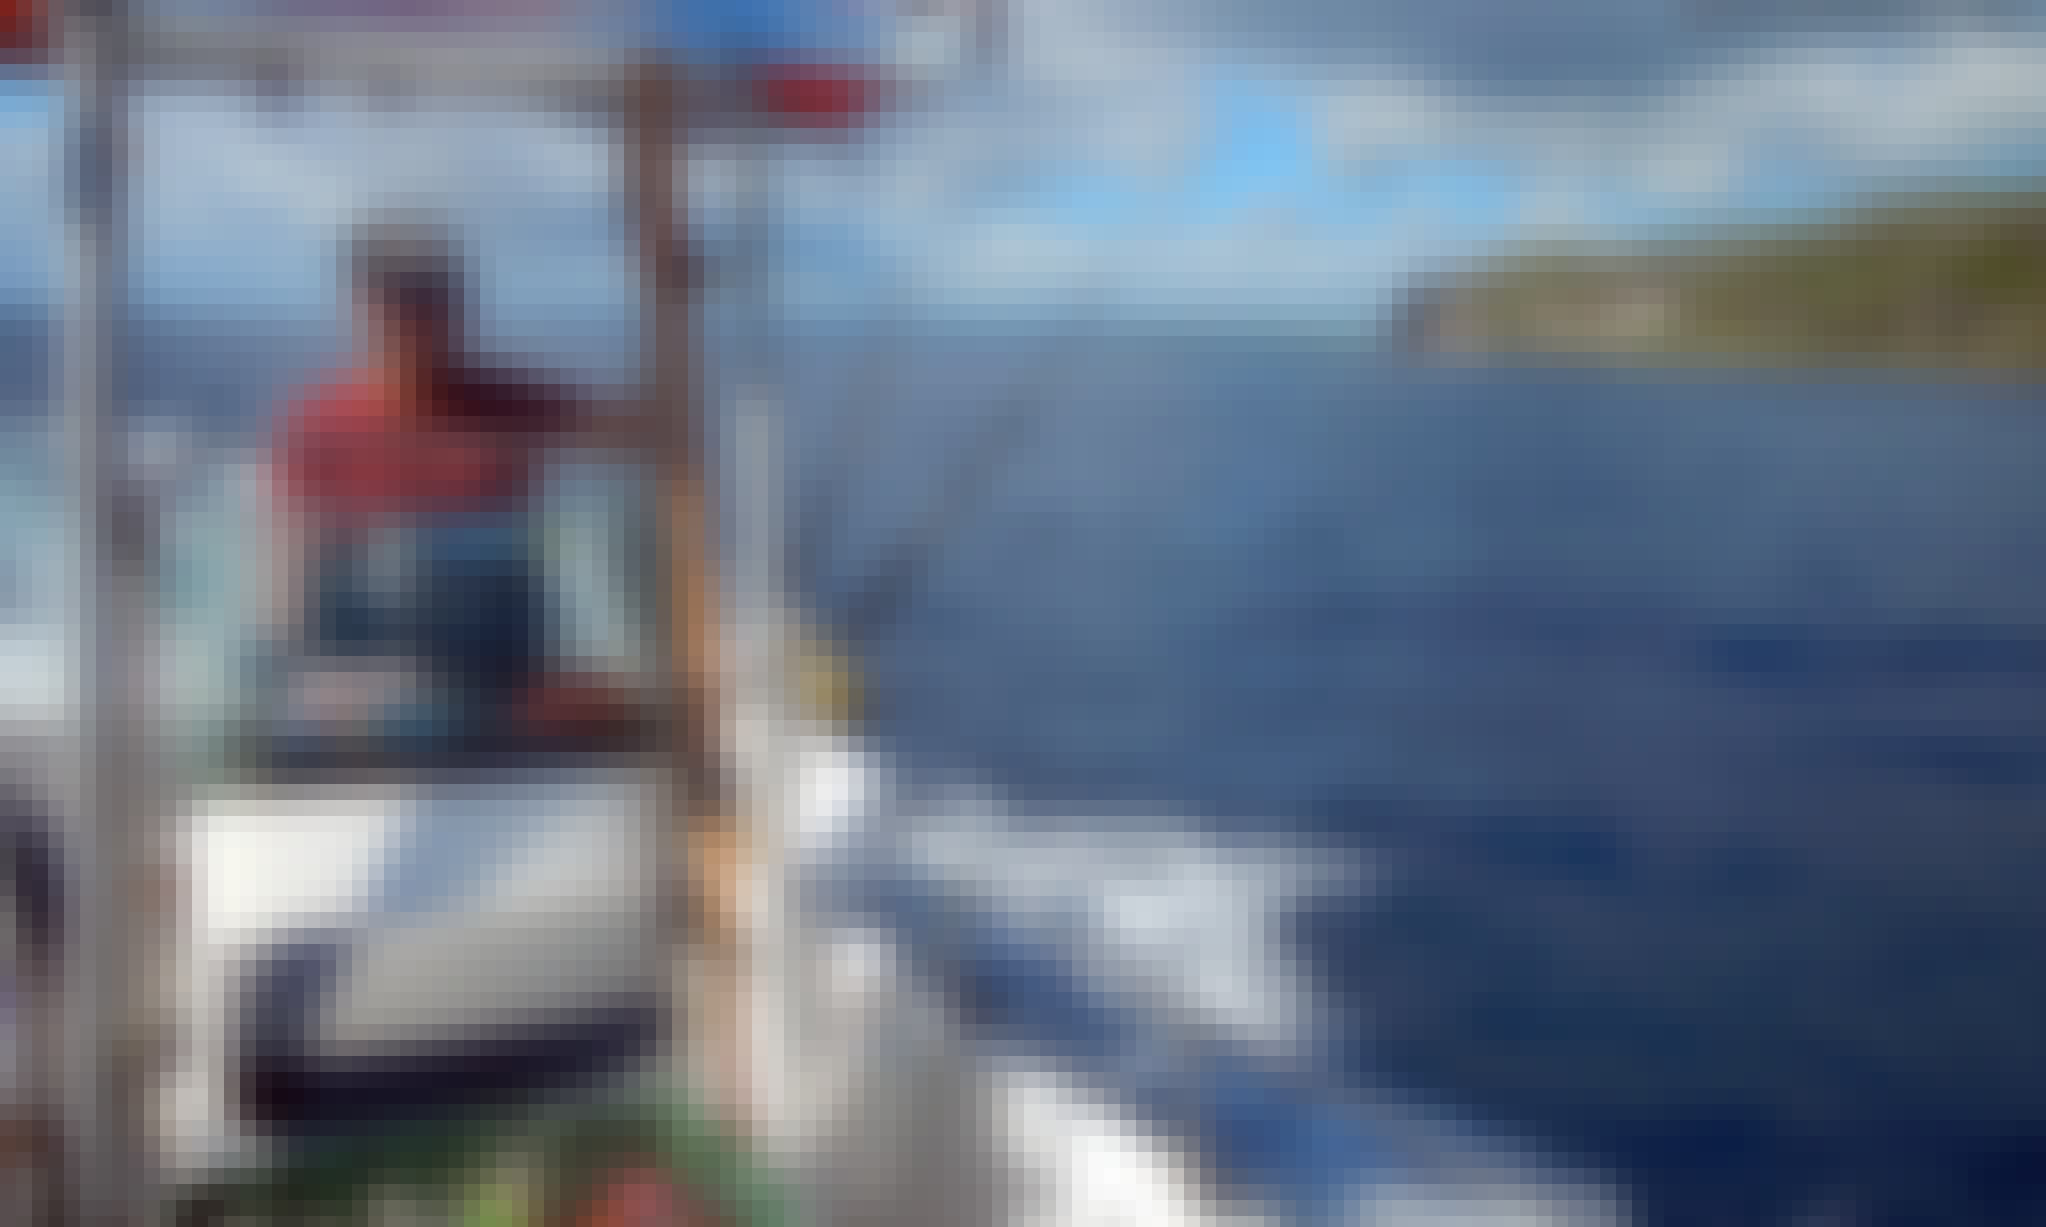 Enjoy Fishing in Lifou, New Caledonia on Panga 23 Center Console